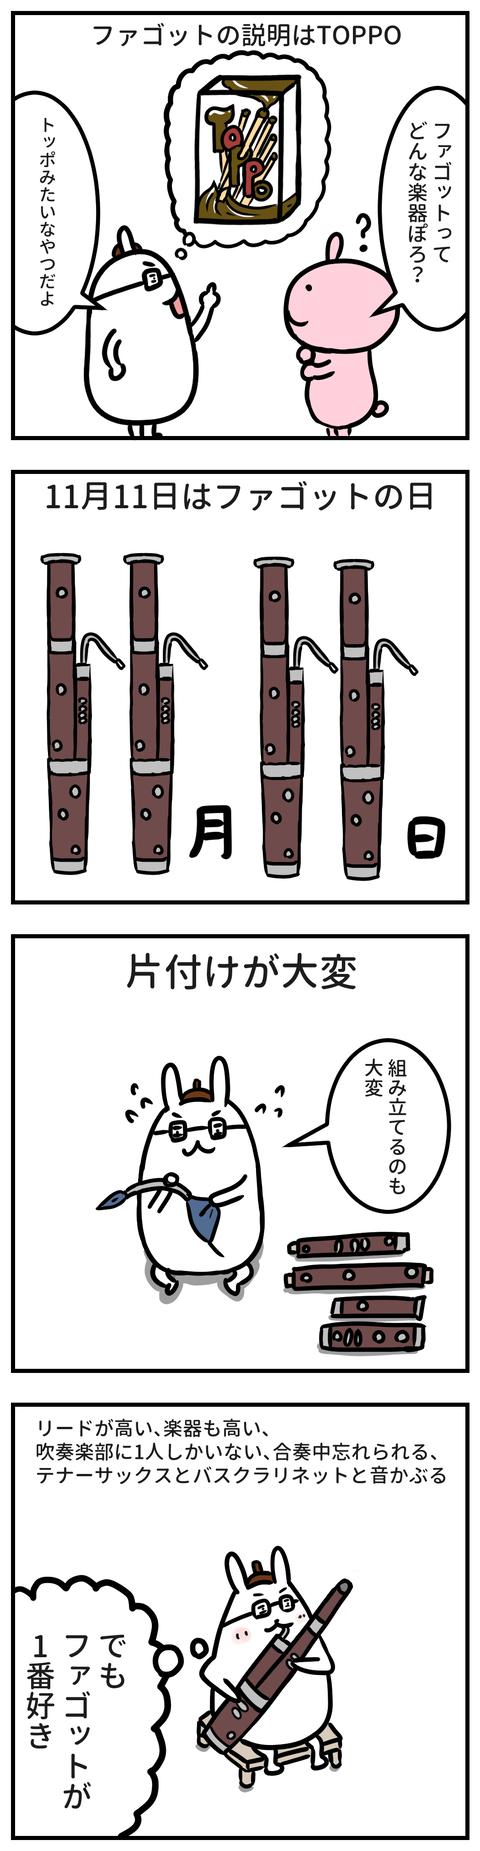 manga-yuzuporo50-1